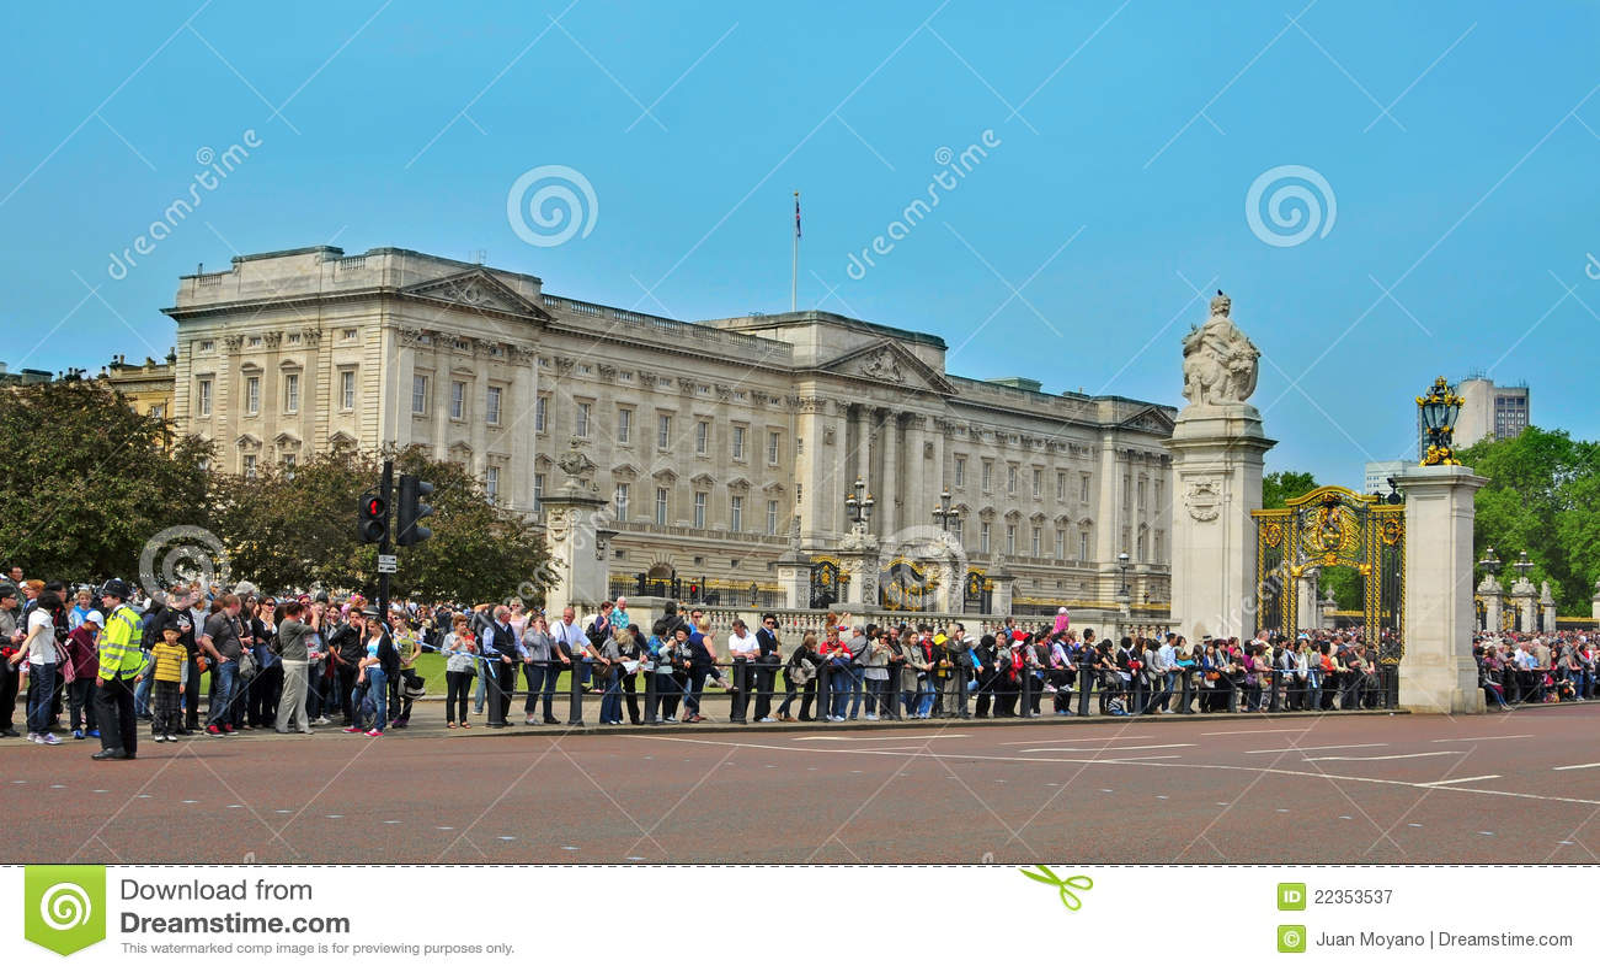 Buckingham王国团结的伦敦宫殿